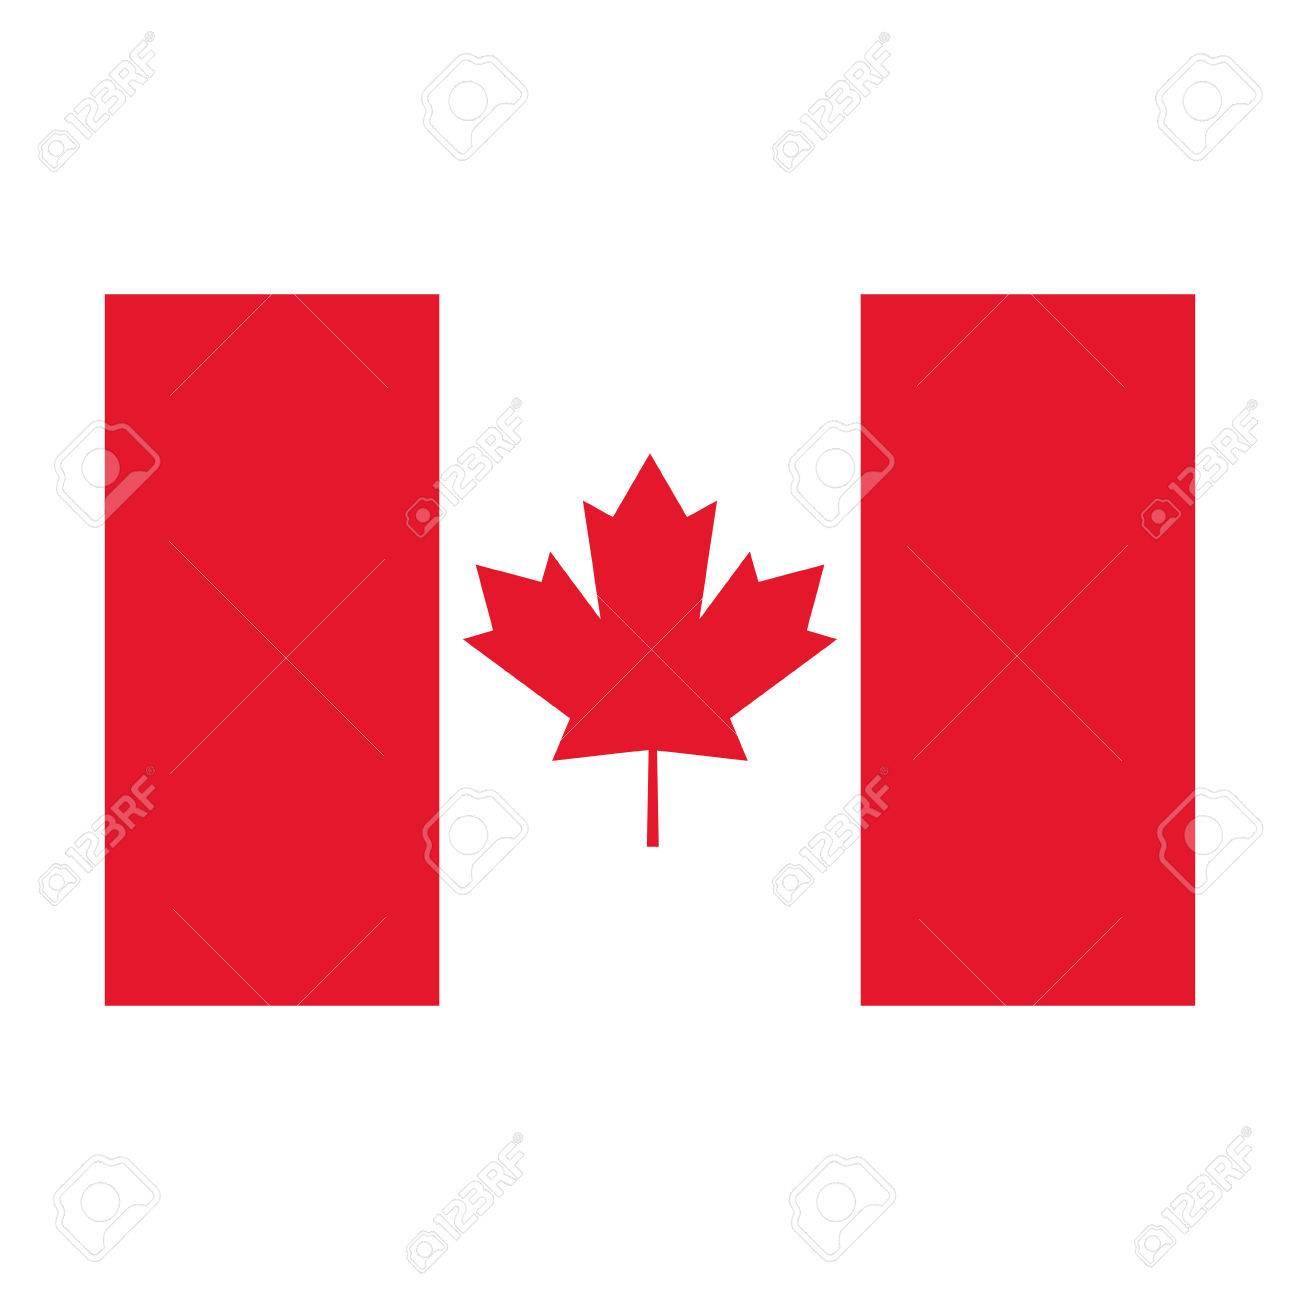 flat design canada flag icon illustration royalty free cliparts rh 123rf com canada flag vector download canada flag vector ai